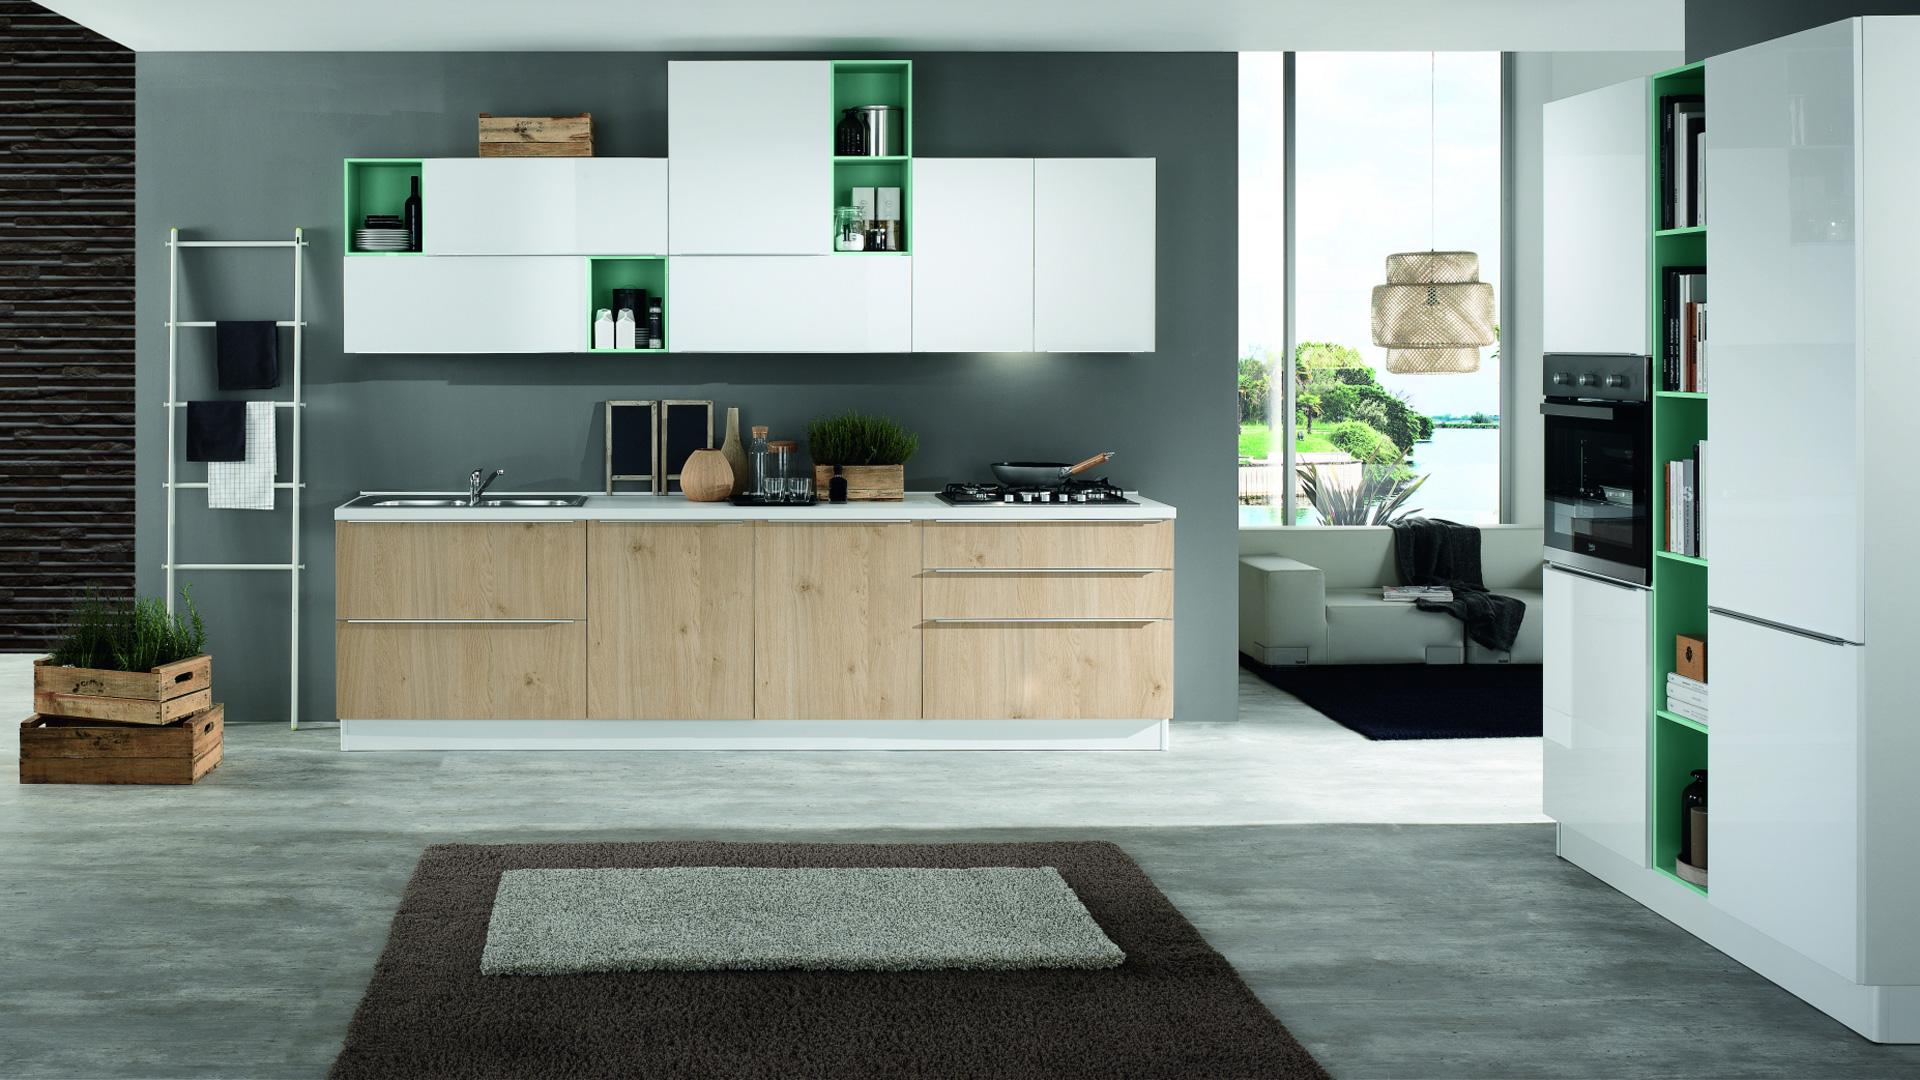 Accessori Bagno Grancasa : Netcucine cucine moderne mia shop online su grancasa